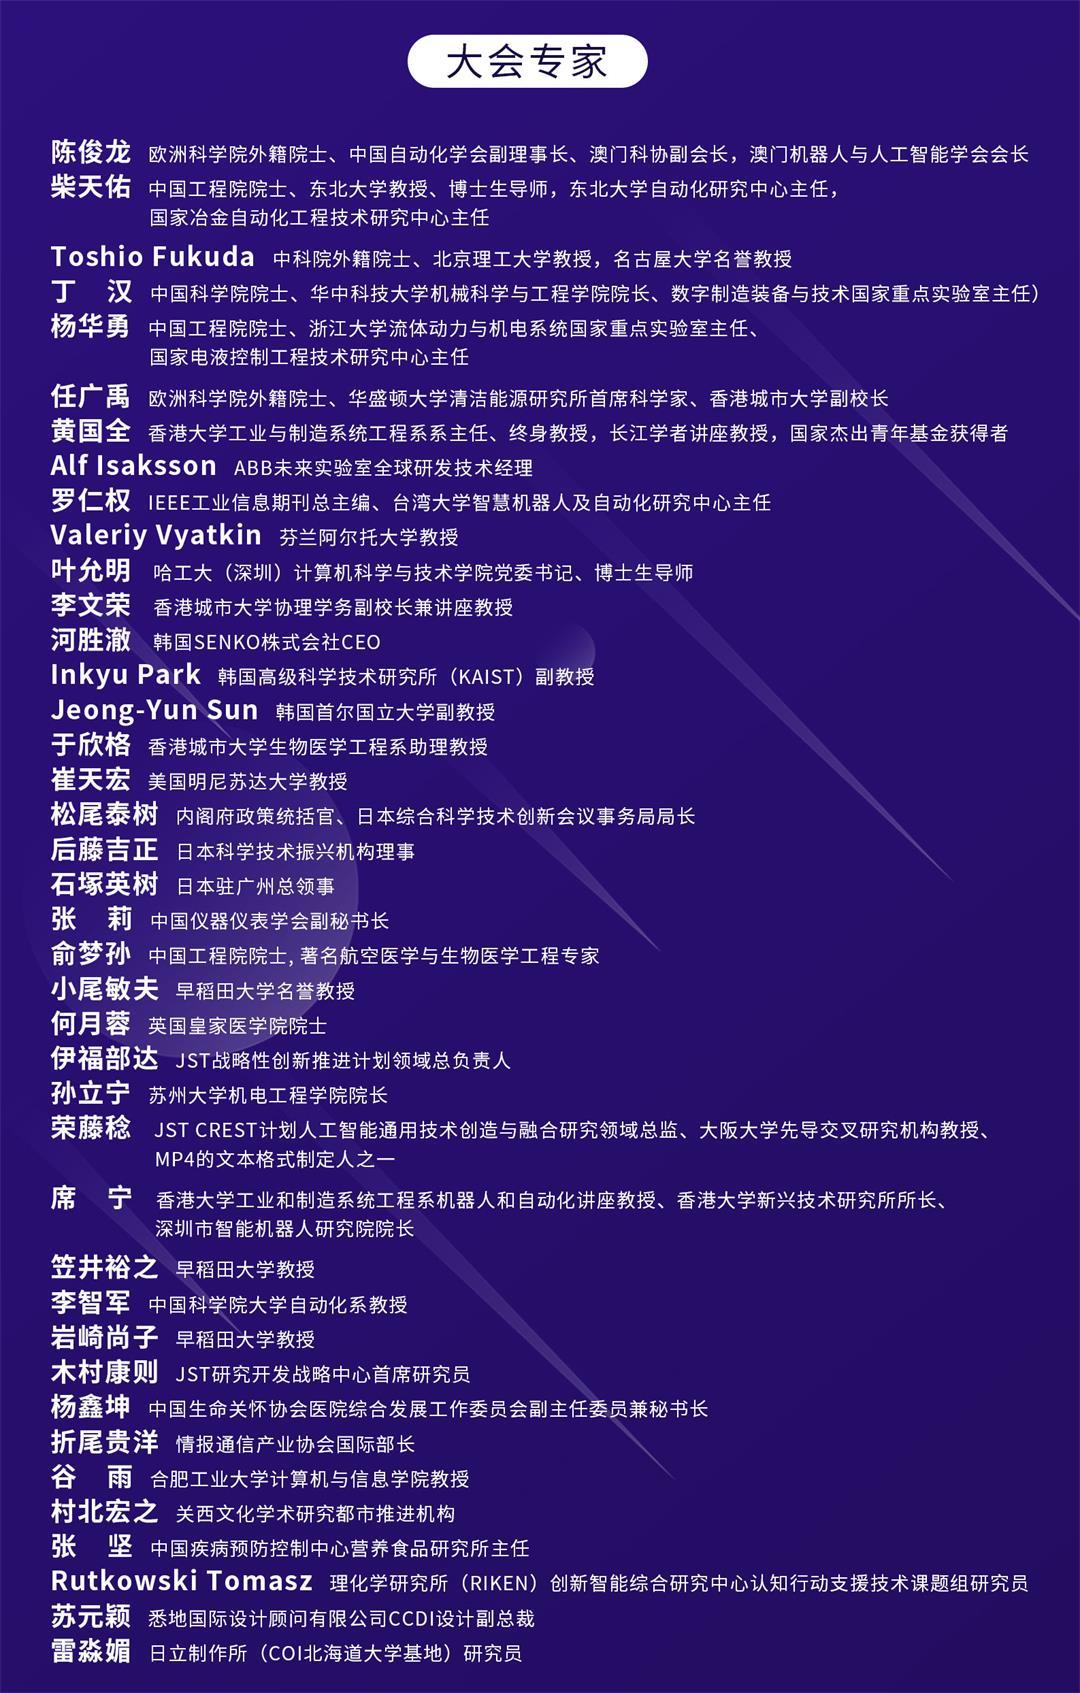 GBAS2019大灣區機器人與人工智能大會(深圳)